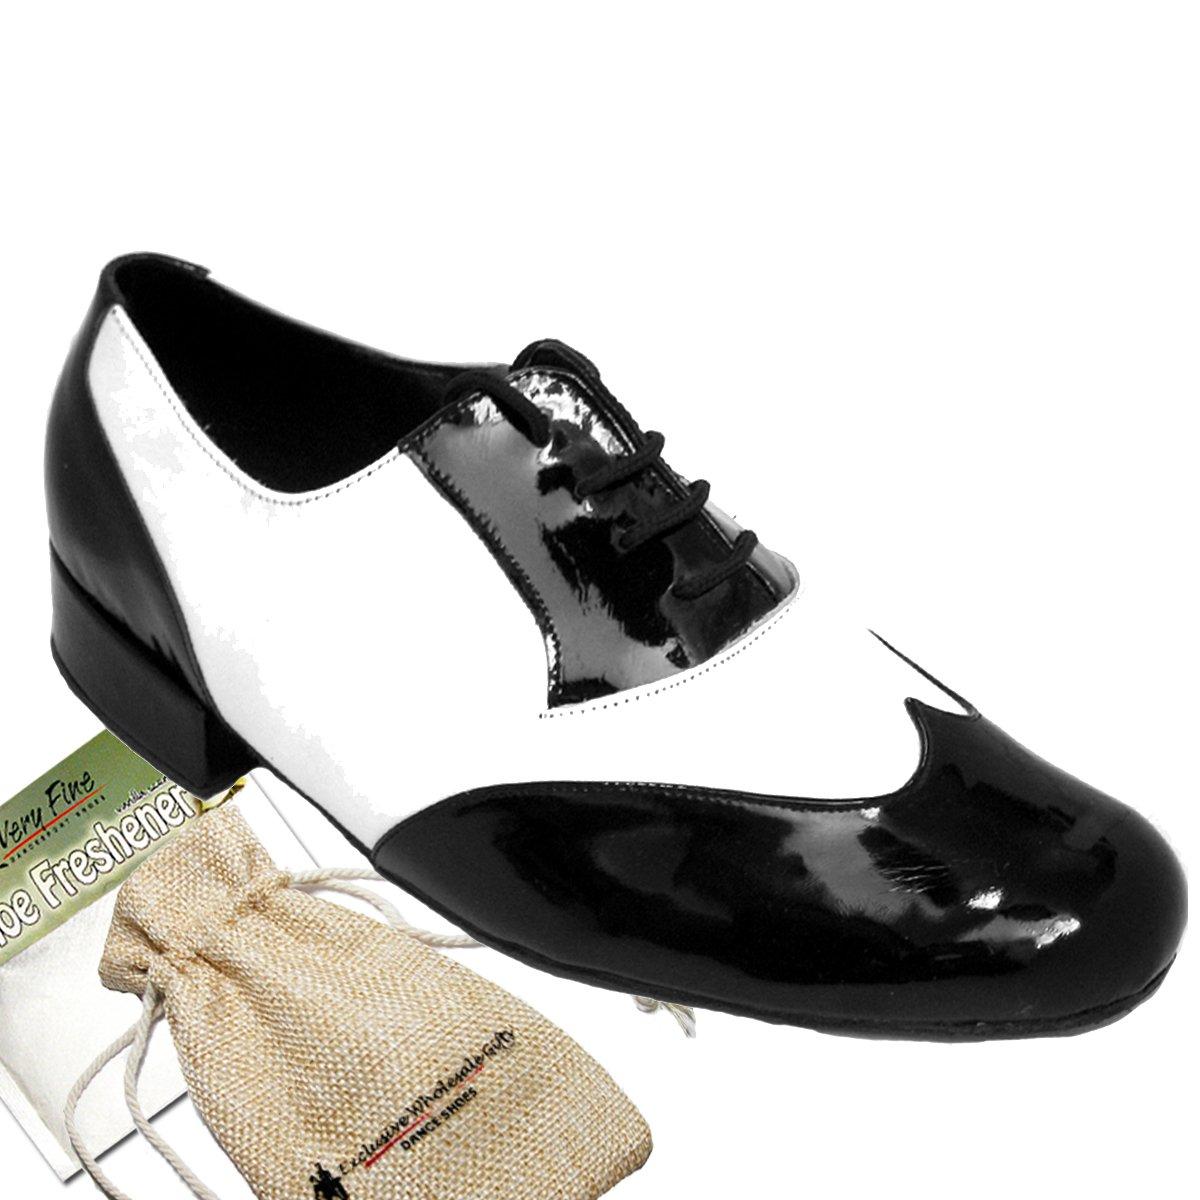 [Very Fine Dance Shoes] メンズ B075H37QY2 10.5 M US: 1